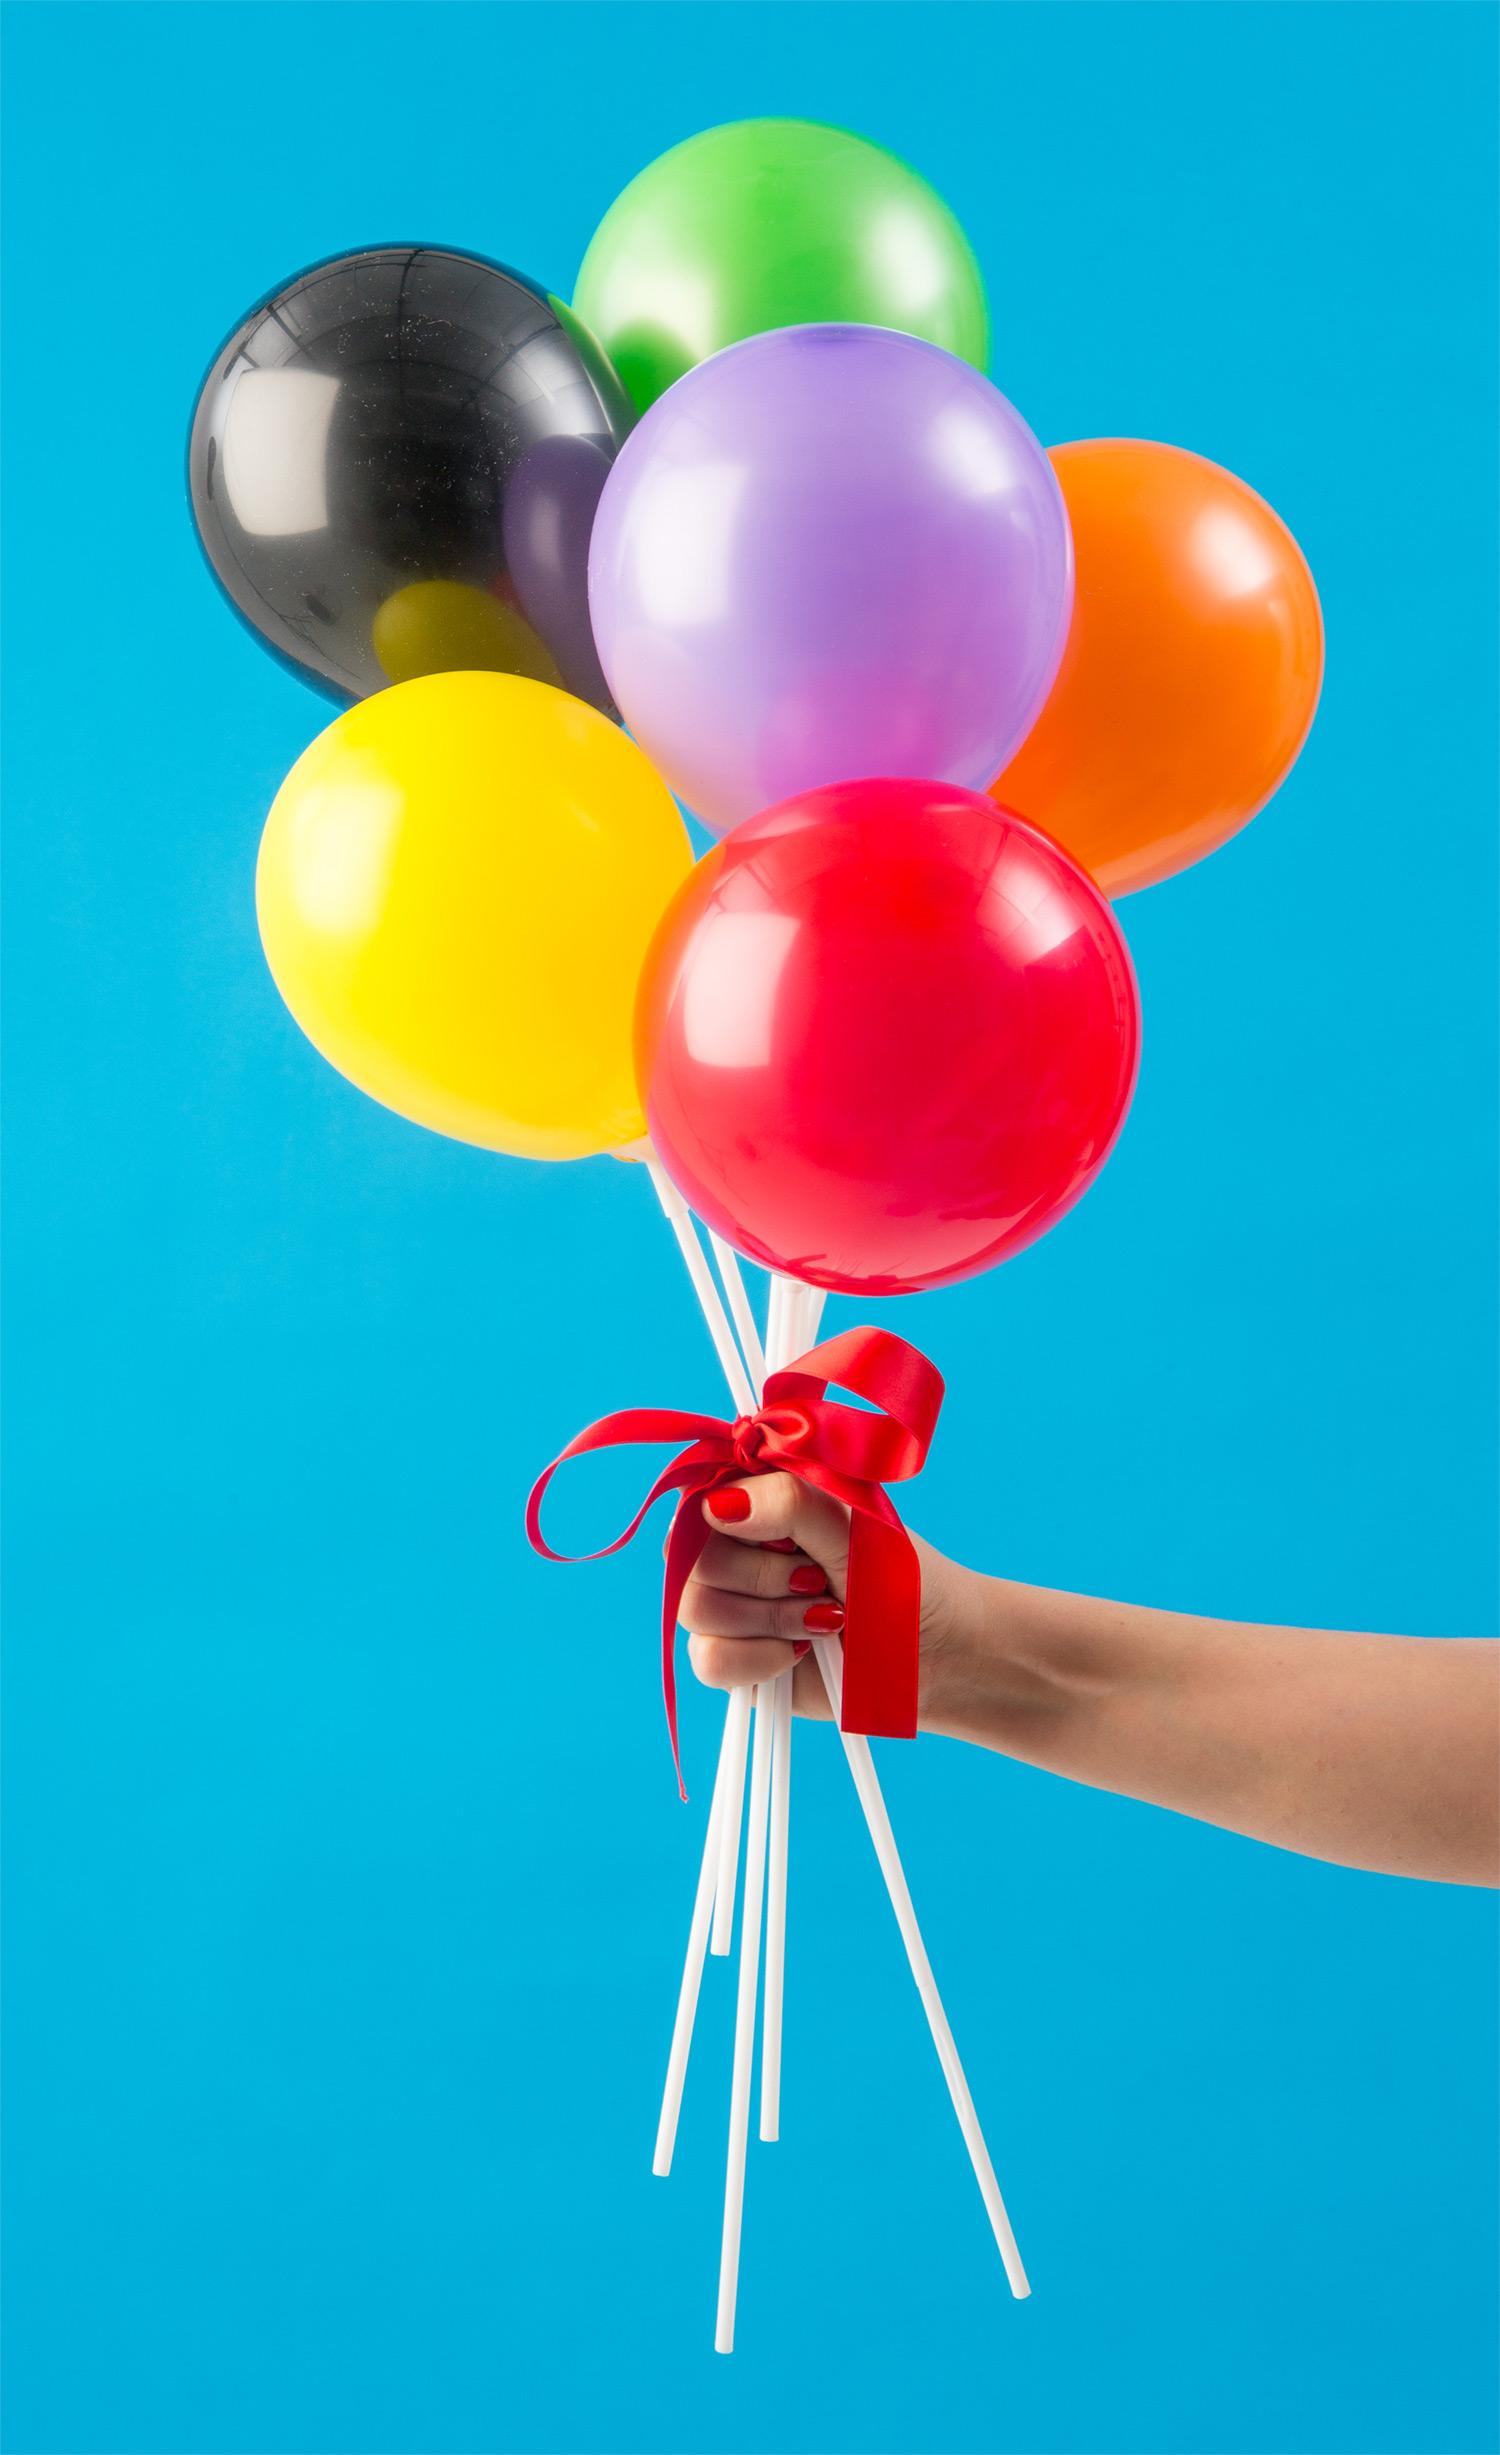 miniballonger.jpg